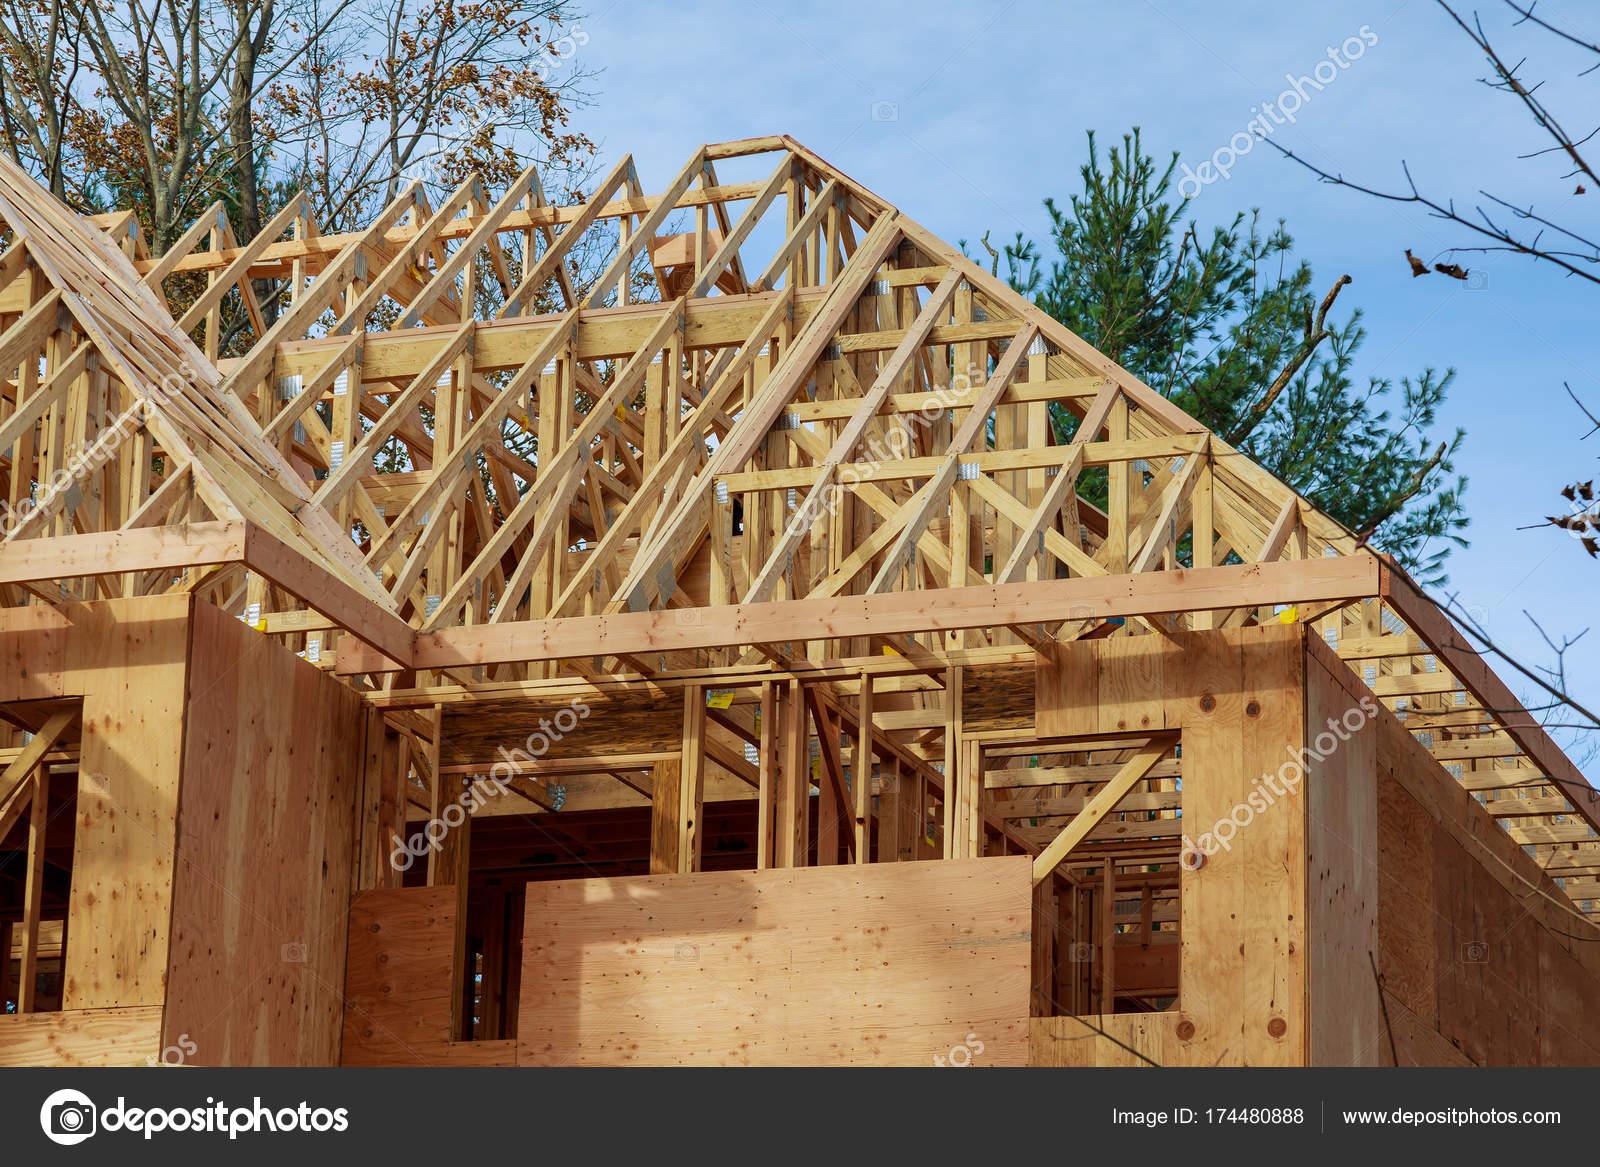 Das Haus Ist Neu In Holz Dach Neubau Nach Hause Stockfoto